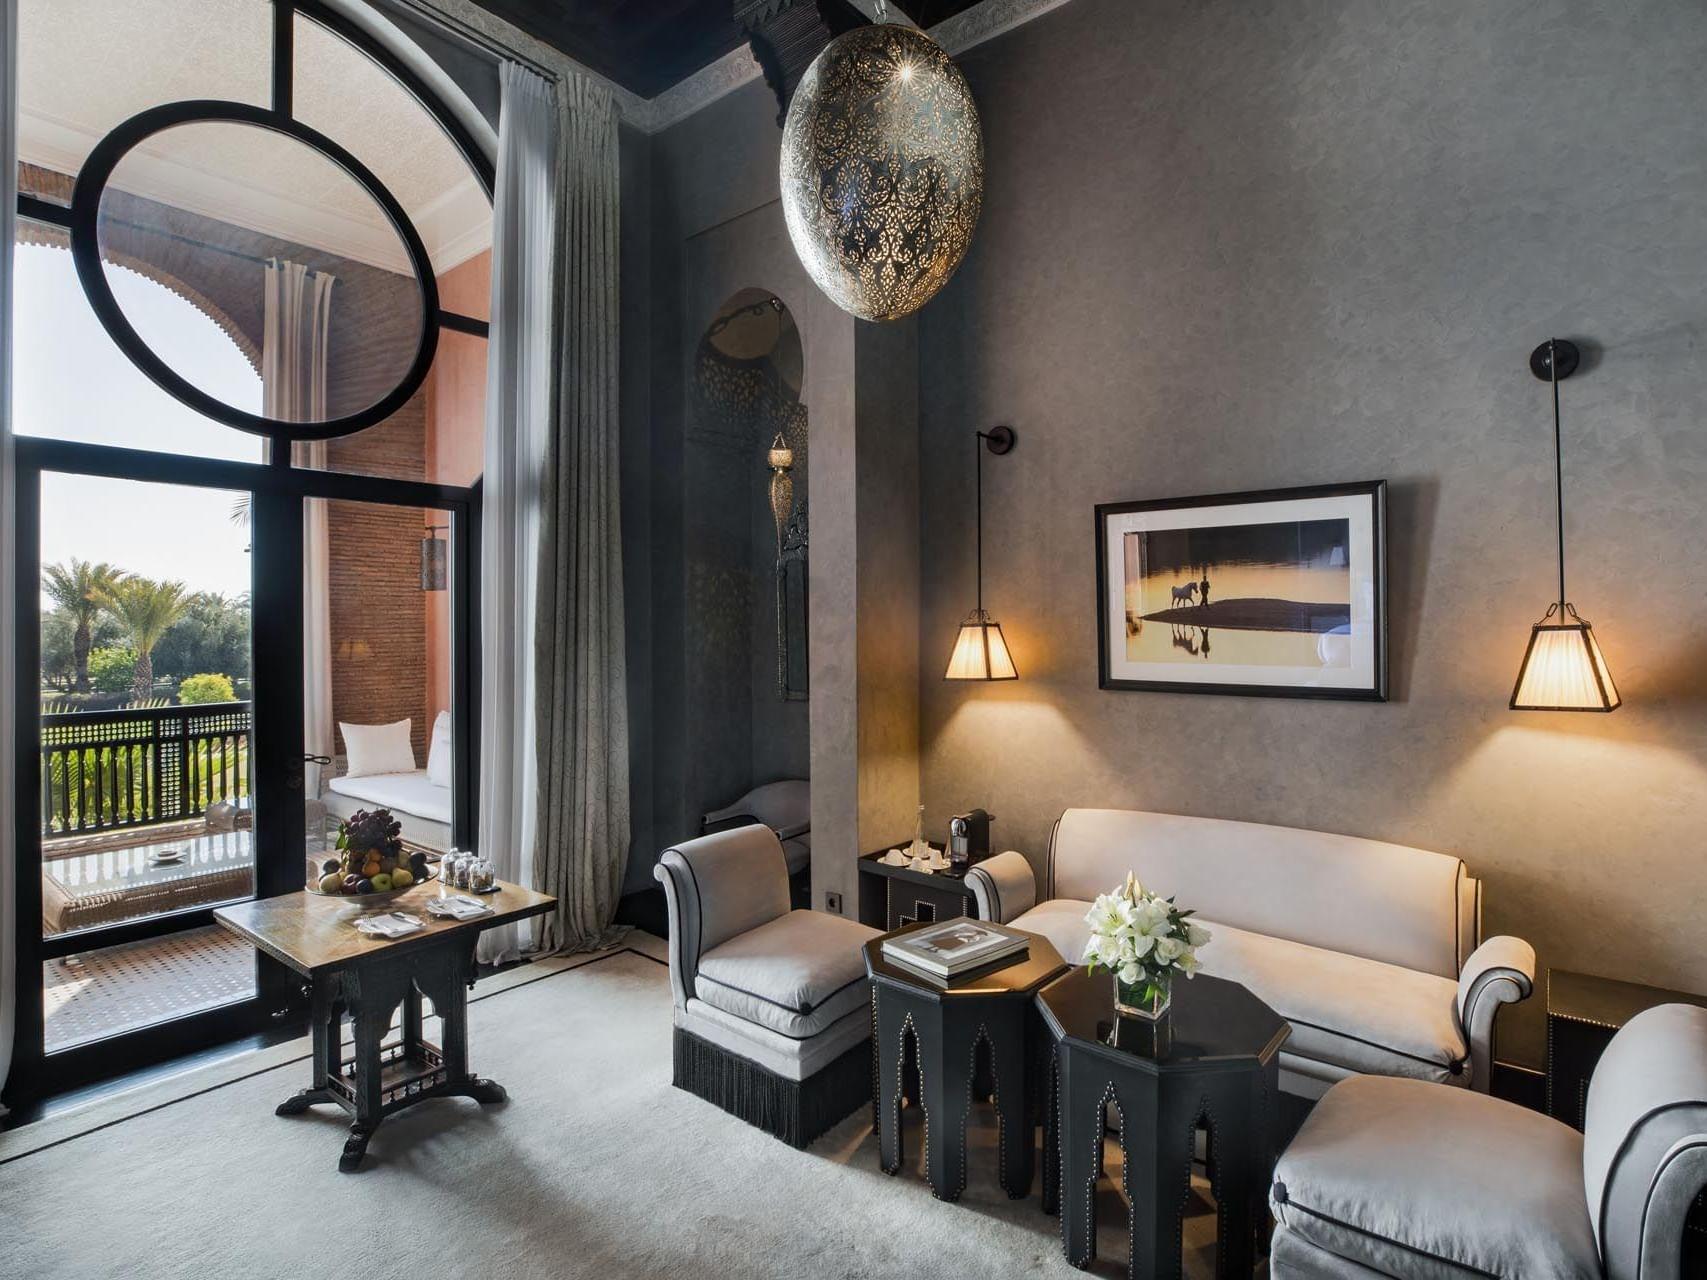 Suite at Selman Marrakech Hotel